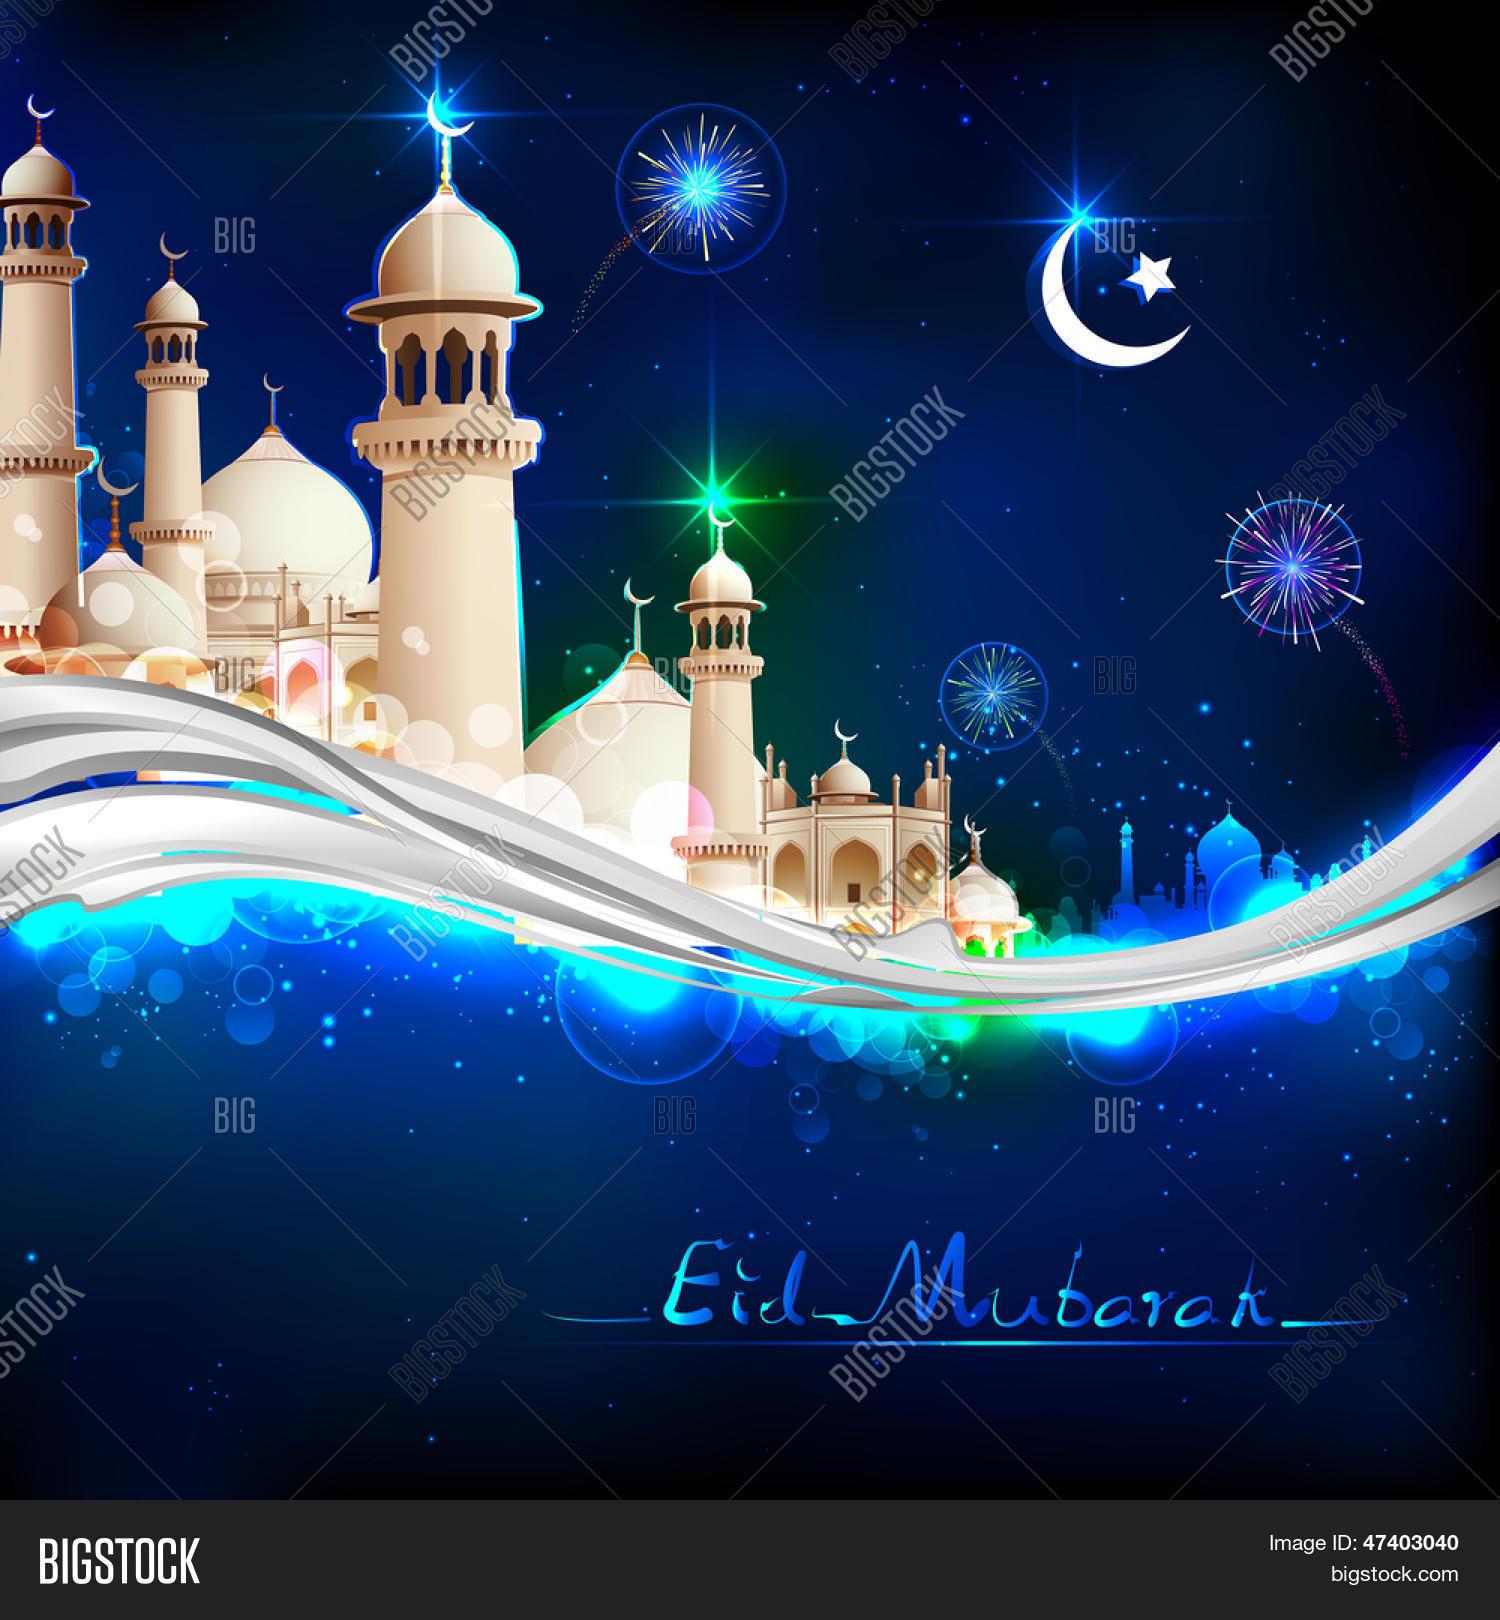 illustration of eid mubarak happy eid background with